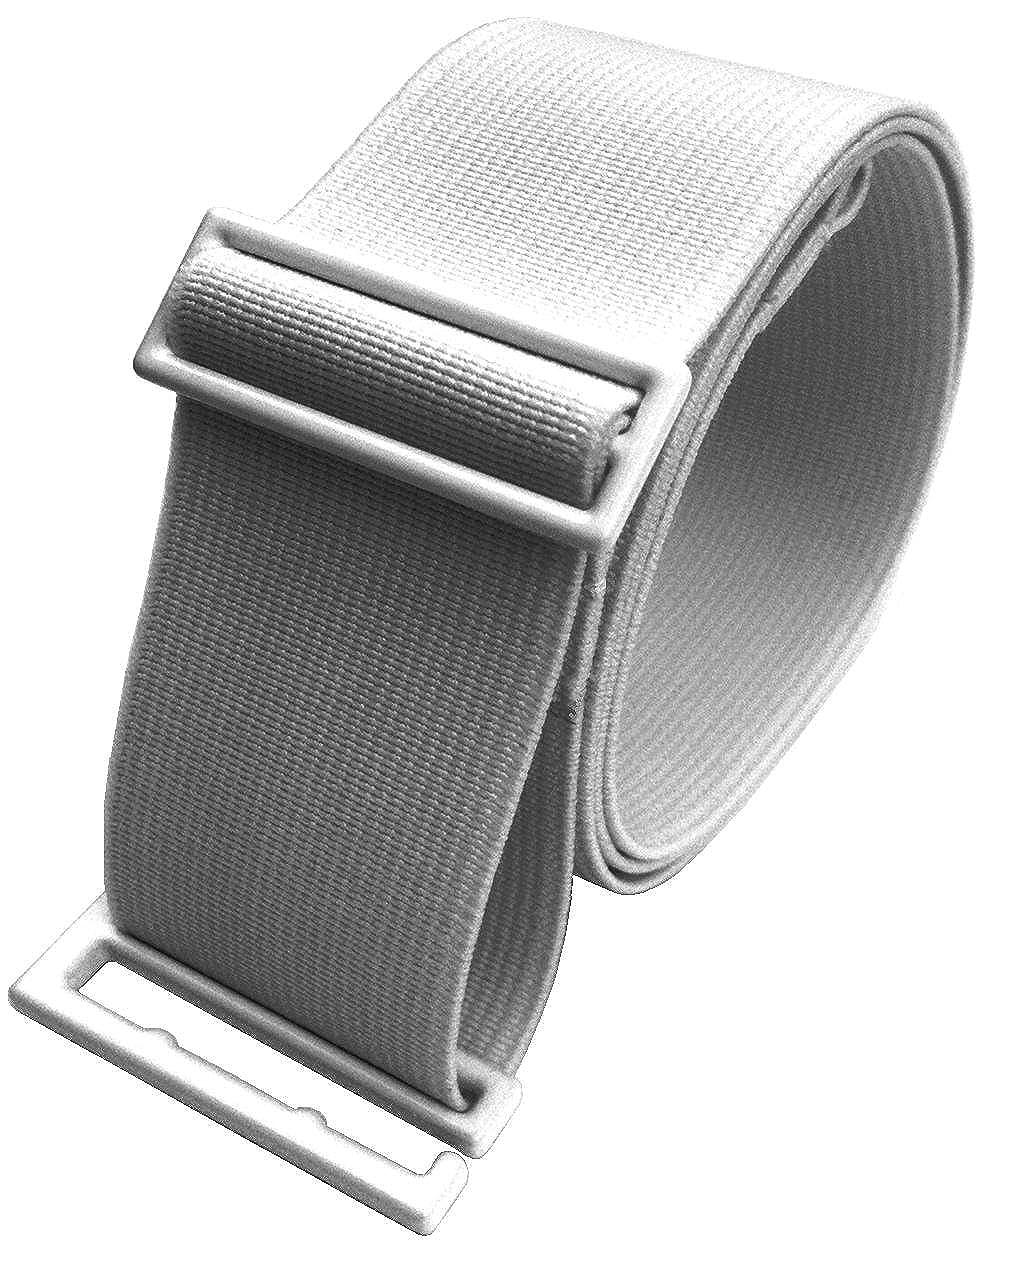 SkinniBelt Women's Elastic Belt